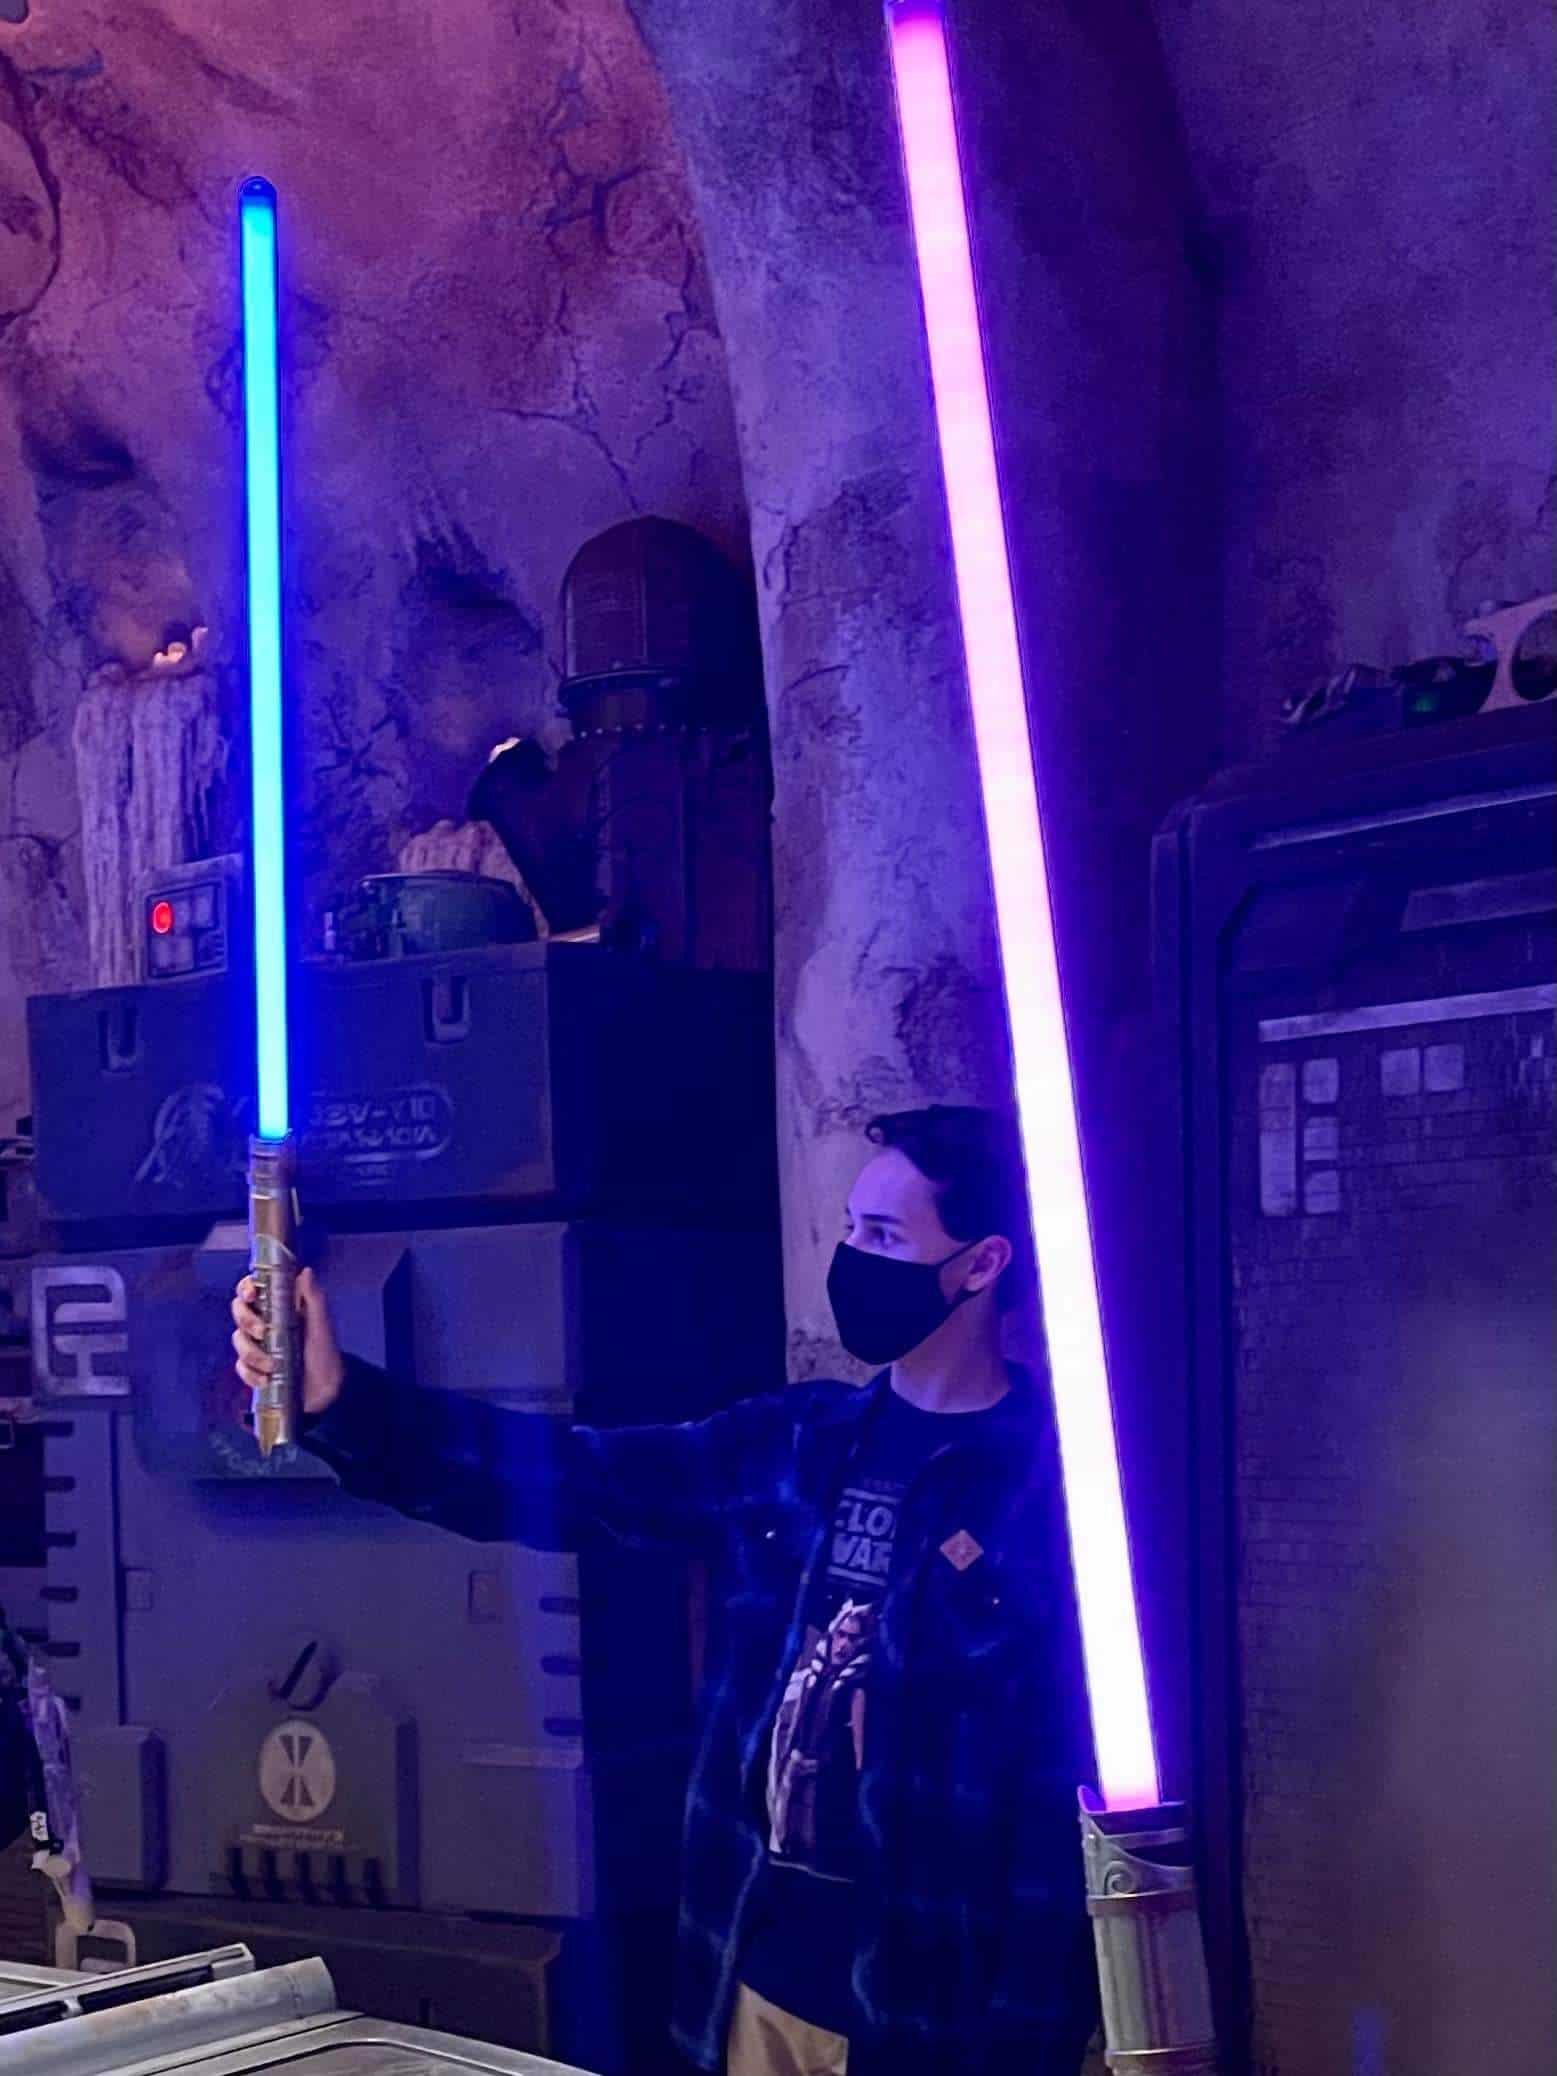 Savi's Workshop at Star Wars Galaxy's Edge Lightsaber Ceremony